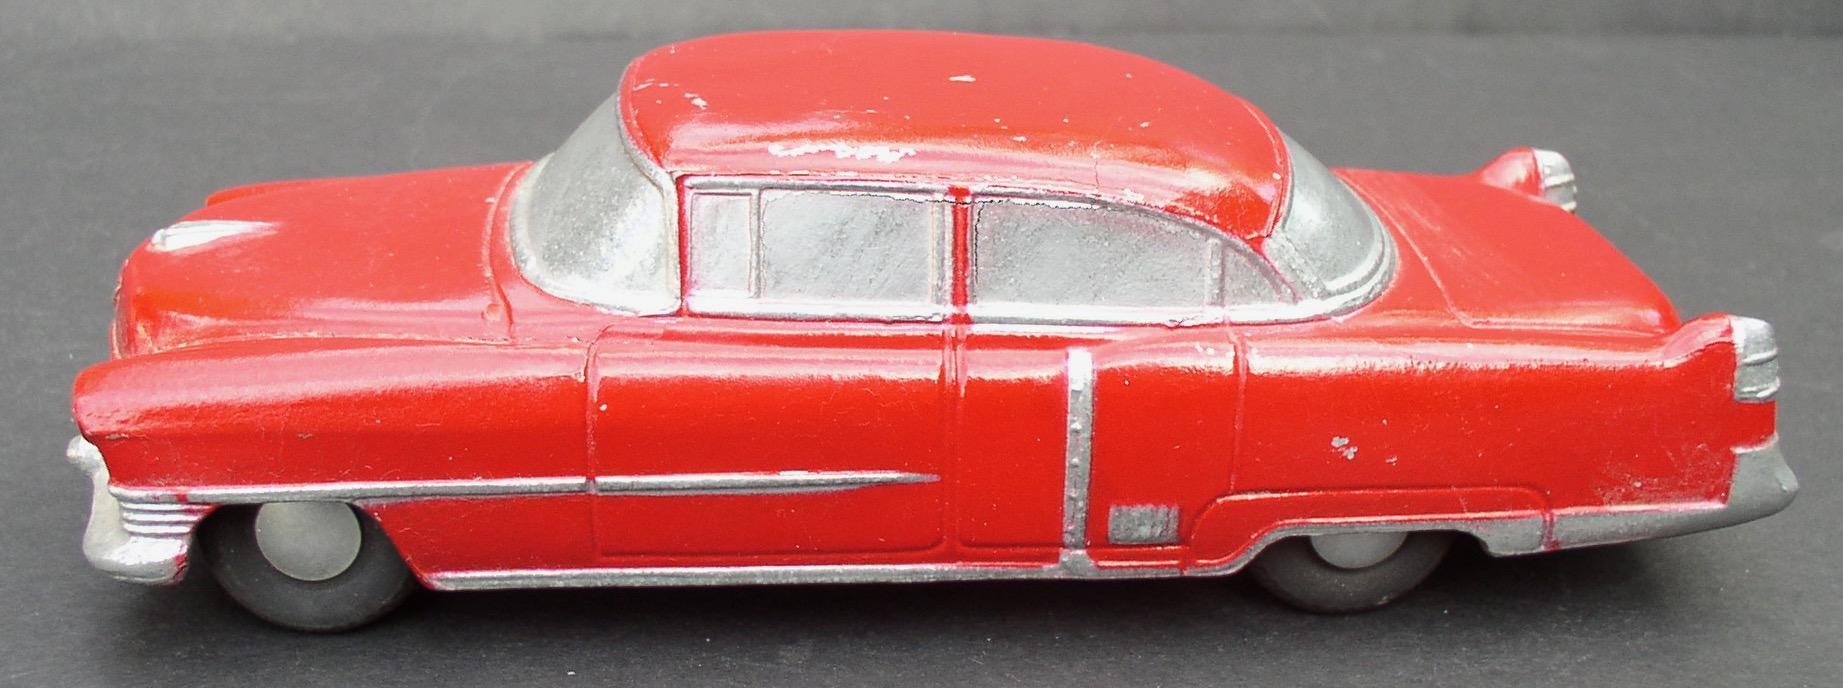 1954 Cadillac Fleetwood BANTHRICO Chicago ILL  Cast Steel Promo Car Bank